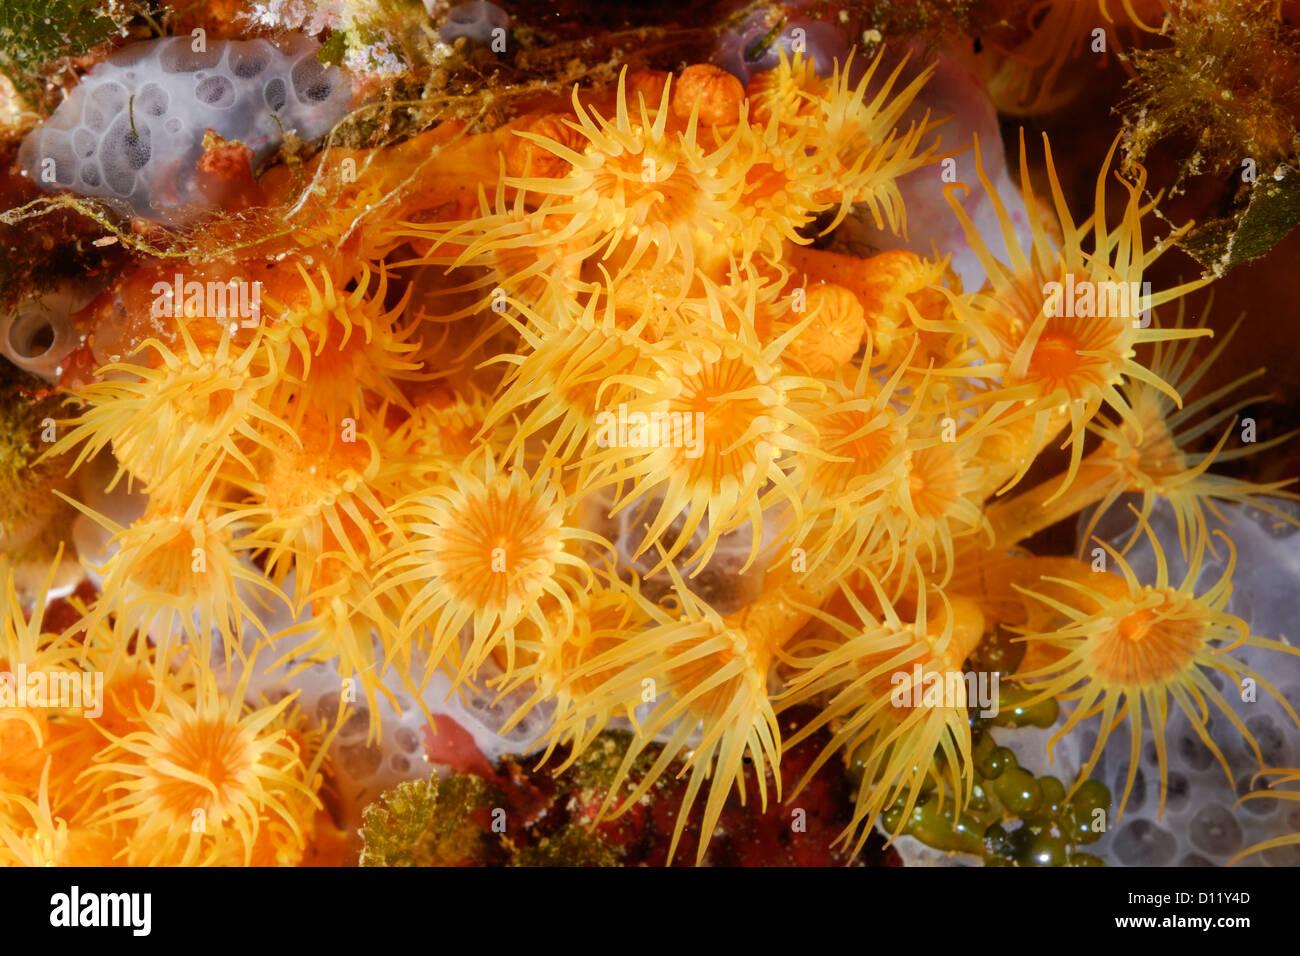 Yellow cluster anemon Parazoanthus axinellae, colonial anthozoa, Celenterata, Capraia Island, Tuscany, Italy, Mediterranean - Stock Image